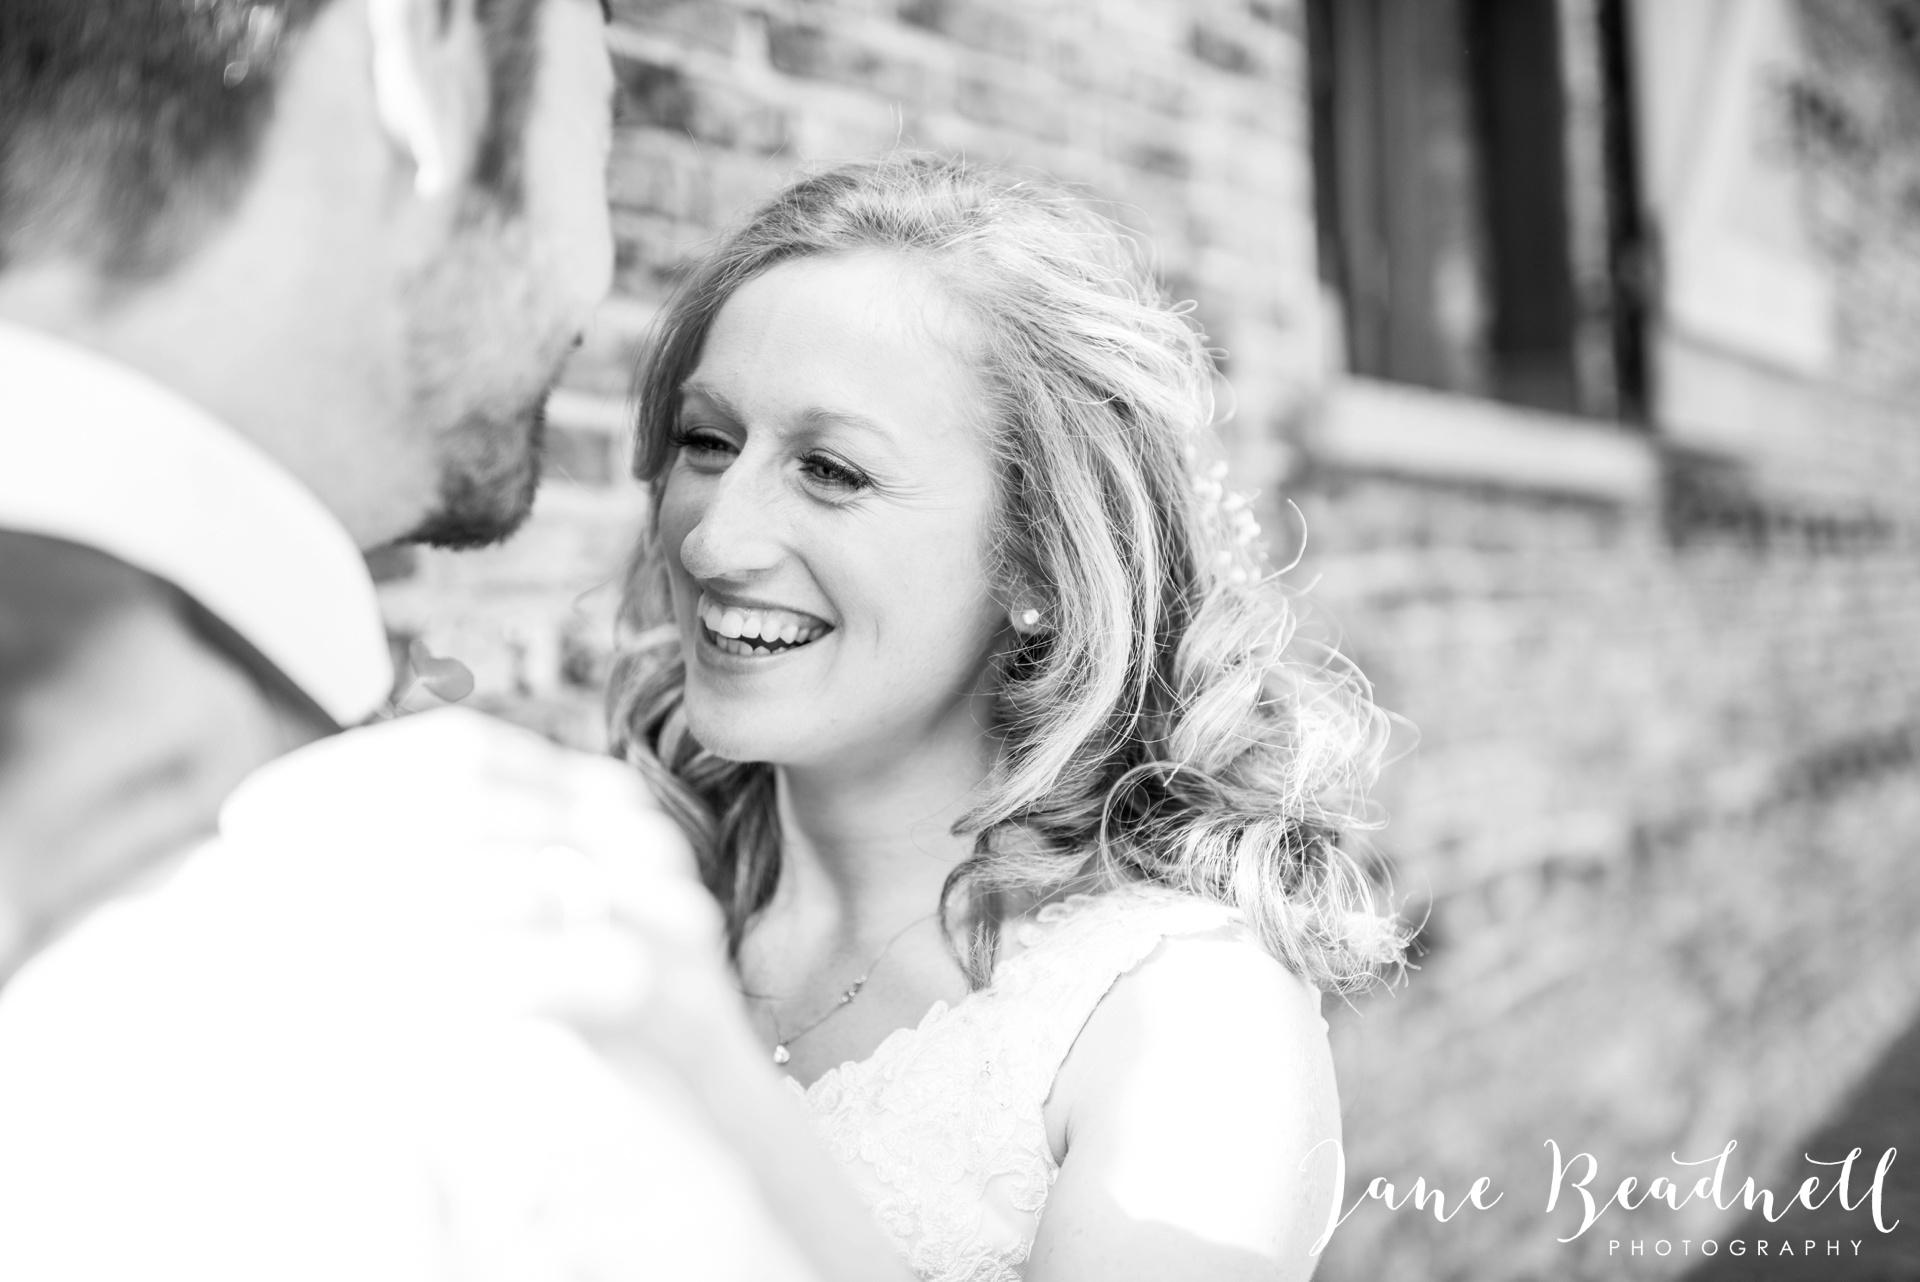 yorkshire-fine-art-wedding-photographer-jane-beadnell-photography-poppleton-york_0116